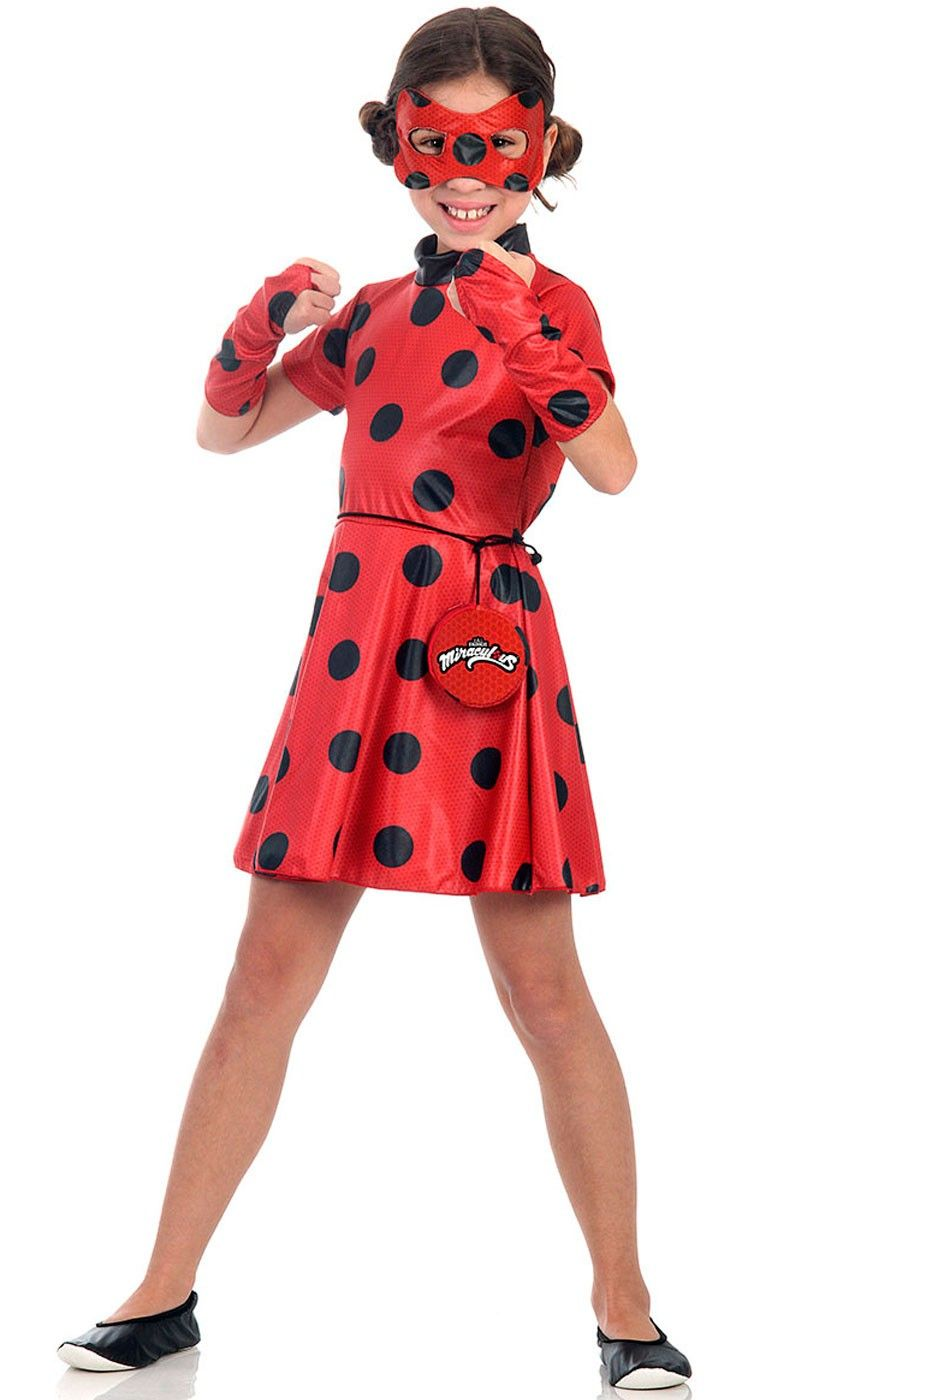 miraculous ladybug costume halloween pinterest. Black Bedroom Furniture Sets. Home Design Ideas